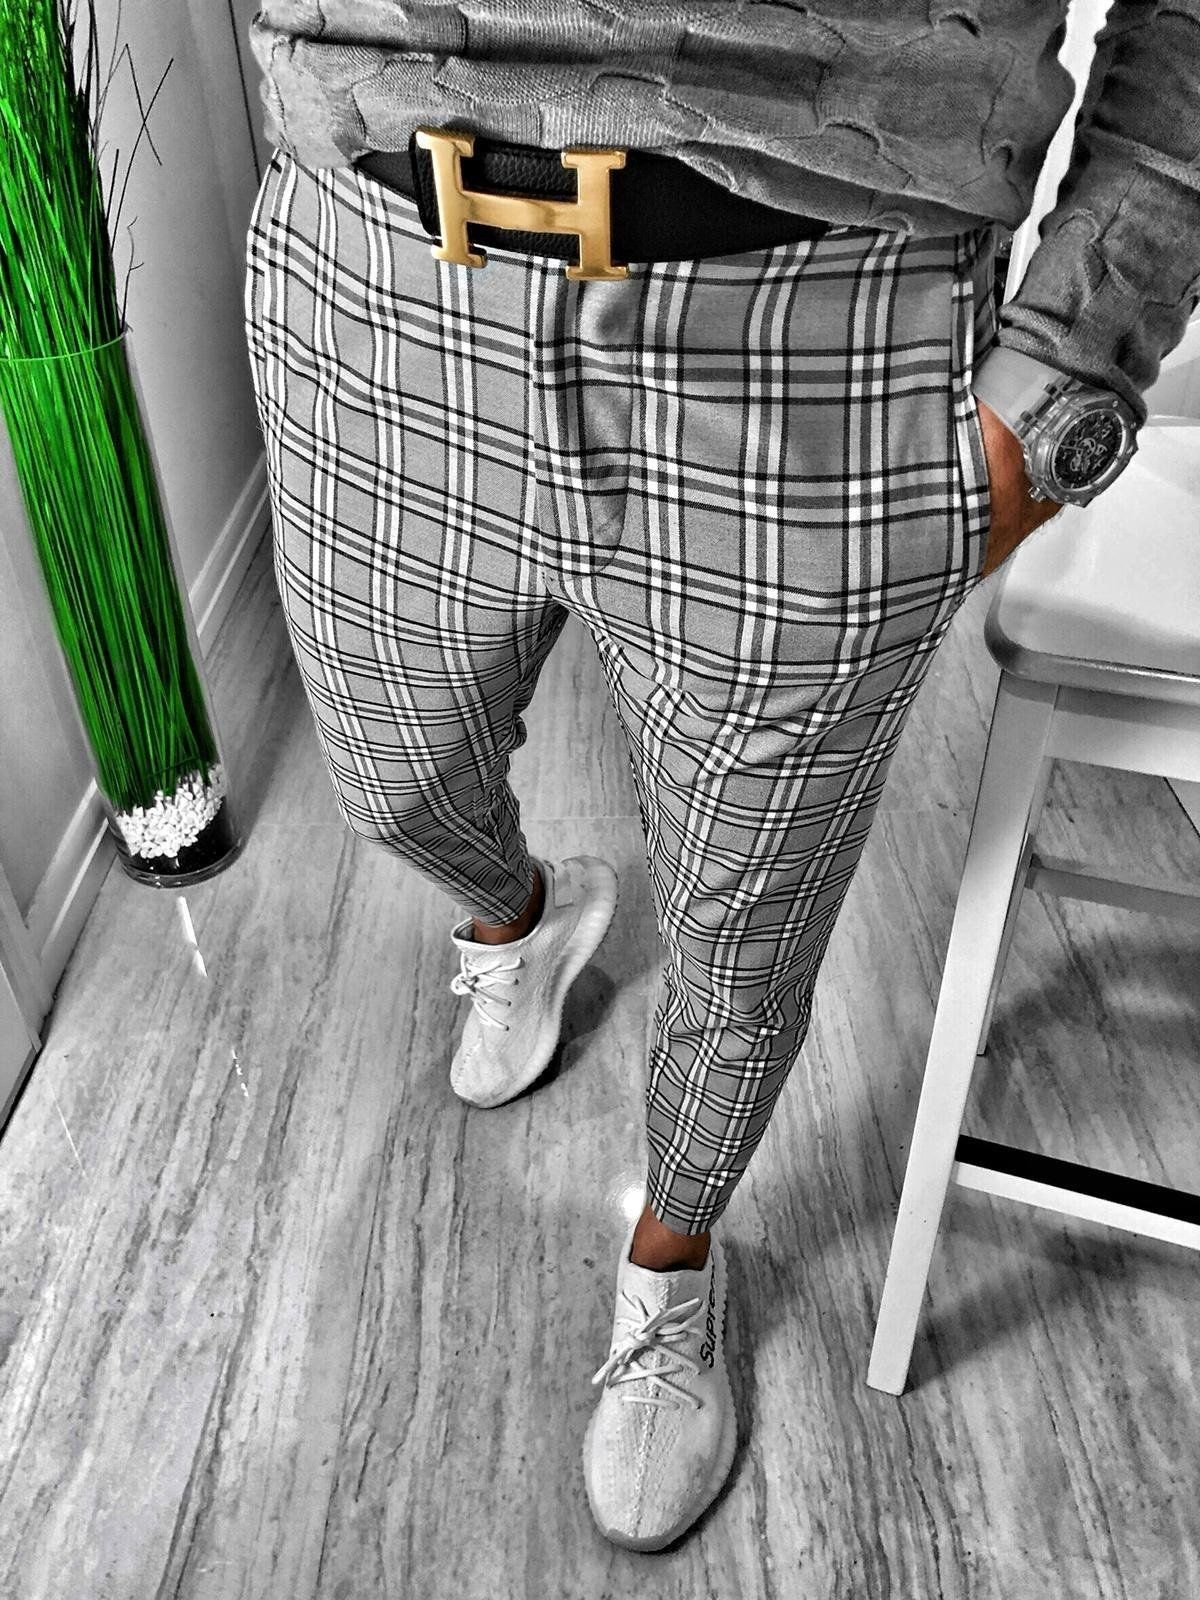 High Fashion Mens Skinny Track Pants Black Grey Side Strip Style Suit Pants Solid Hip hop Street Casual Pants Buy High Fashion Mens Skinny Track